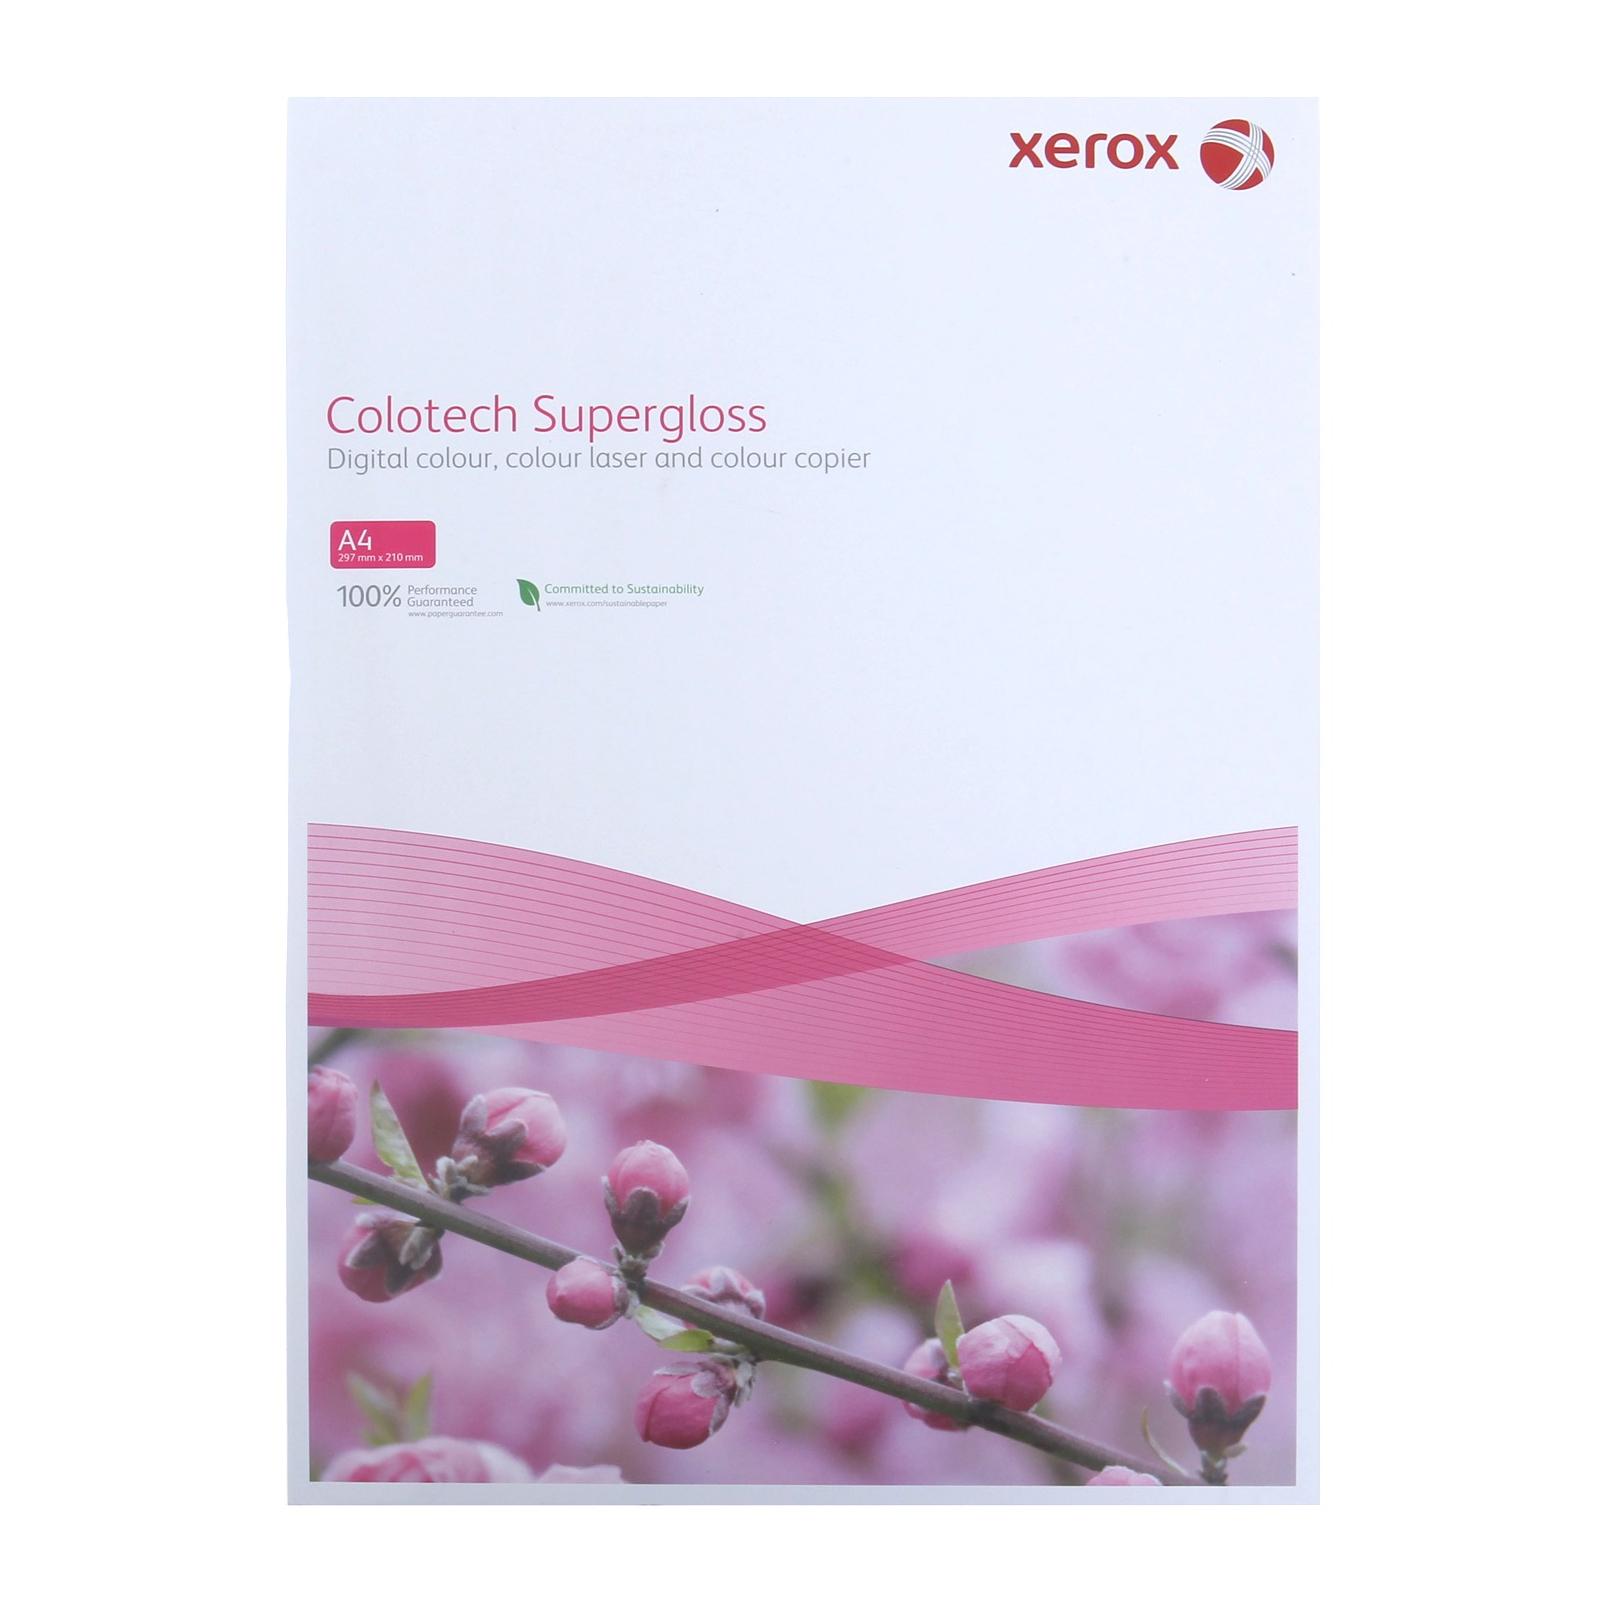 Бумага XEROX A4 COLOTECH + SUPERGLOSS (003R97686)